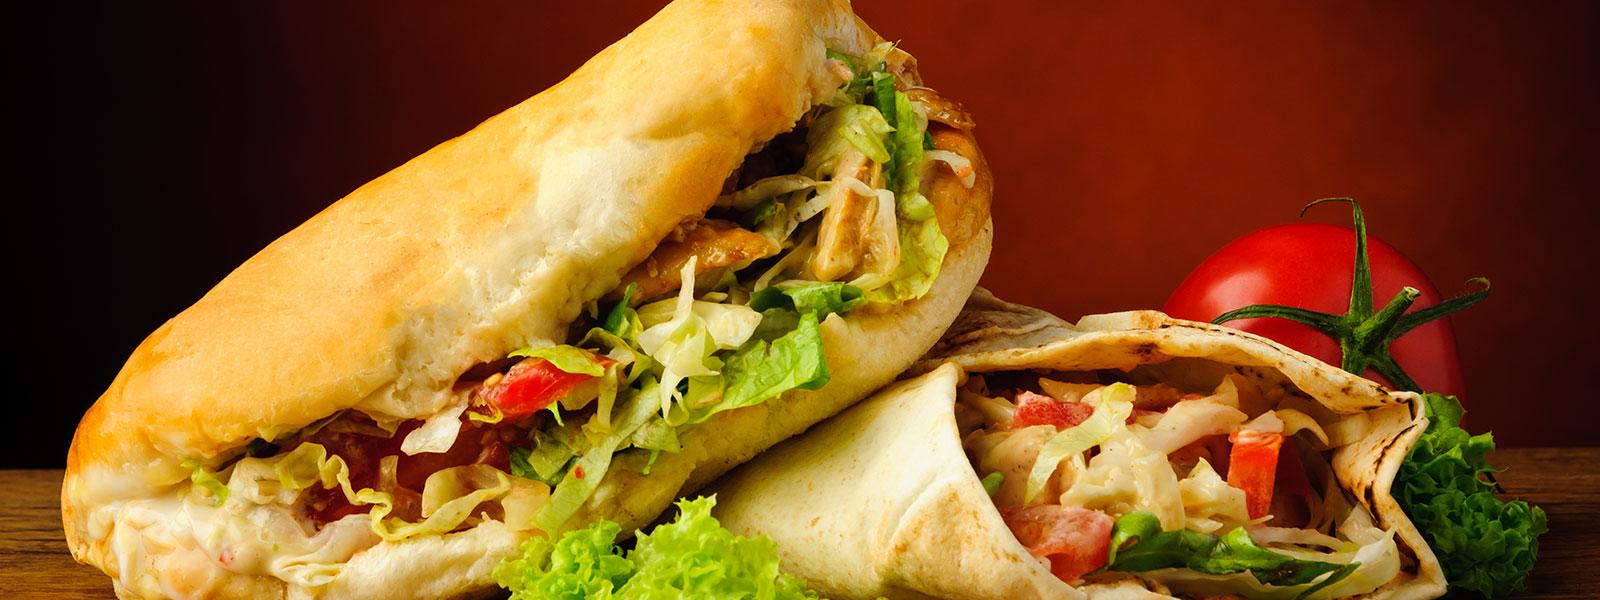 Kebab Junction Order Food Online Takeaways In Middleport